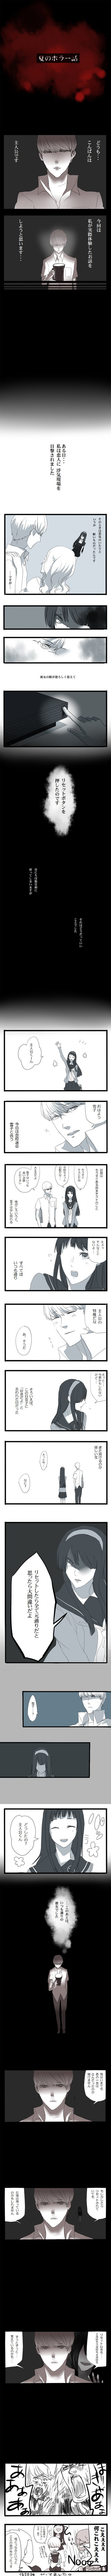 hanamura yousuke, satonaka chie, tatsumi kanji, amagi yukiko, narukami yuu, and etc (persona 4 and etc) drawn by nasie